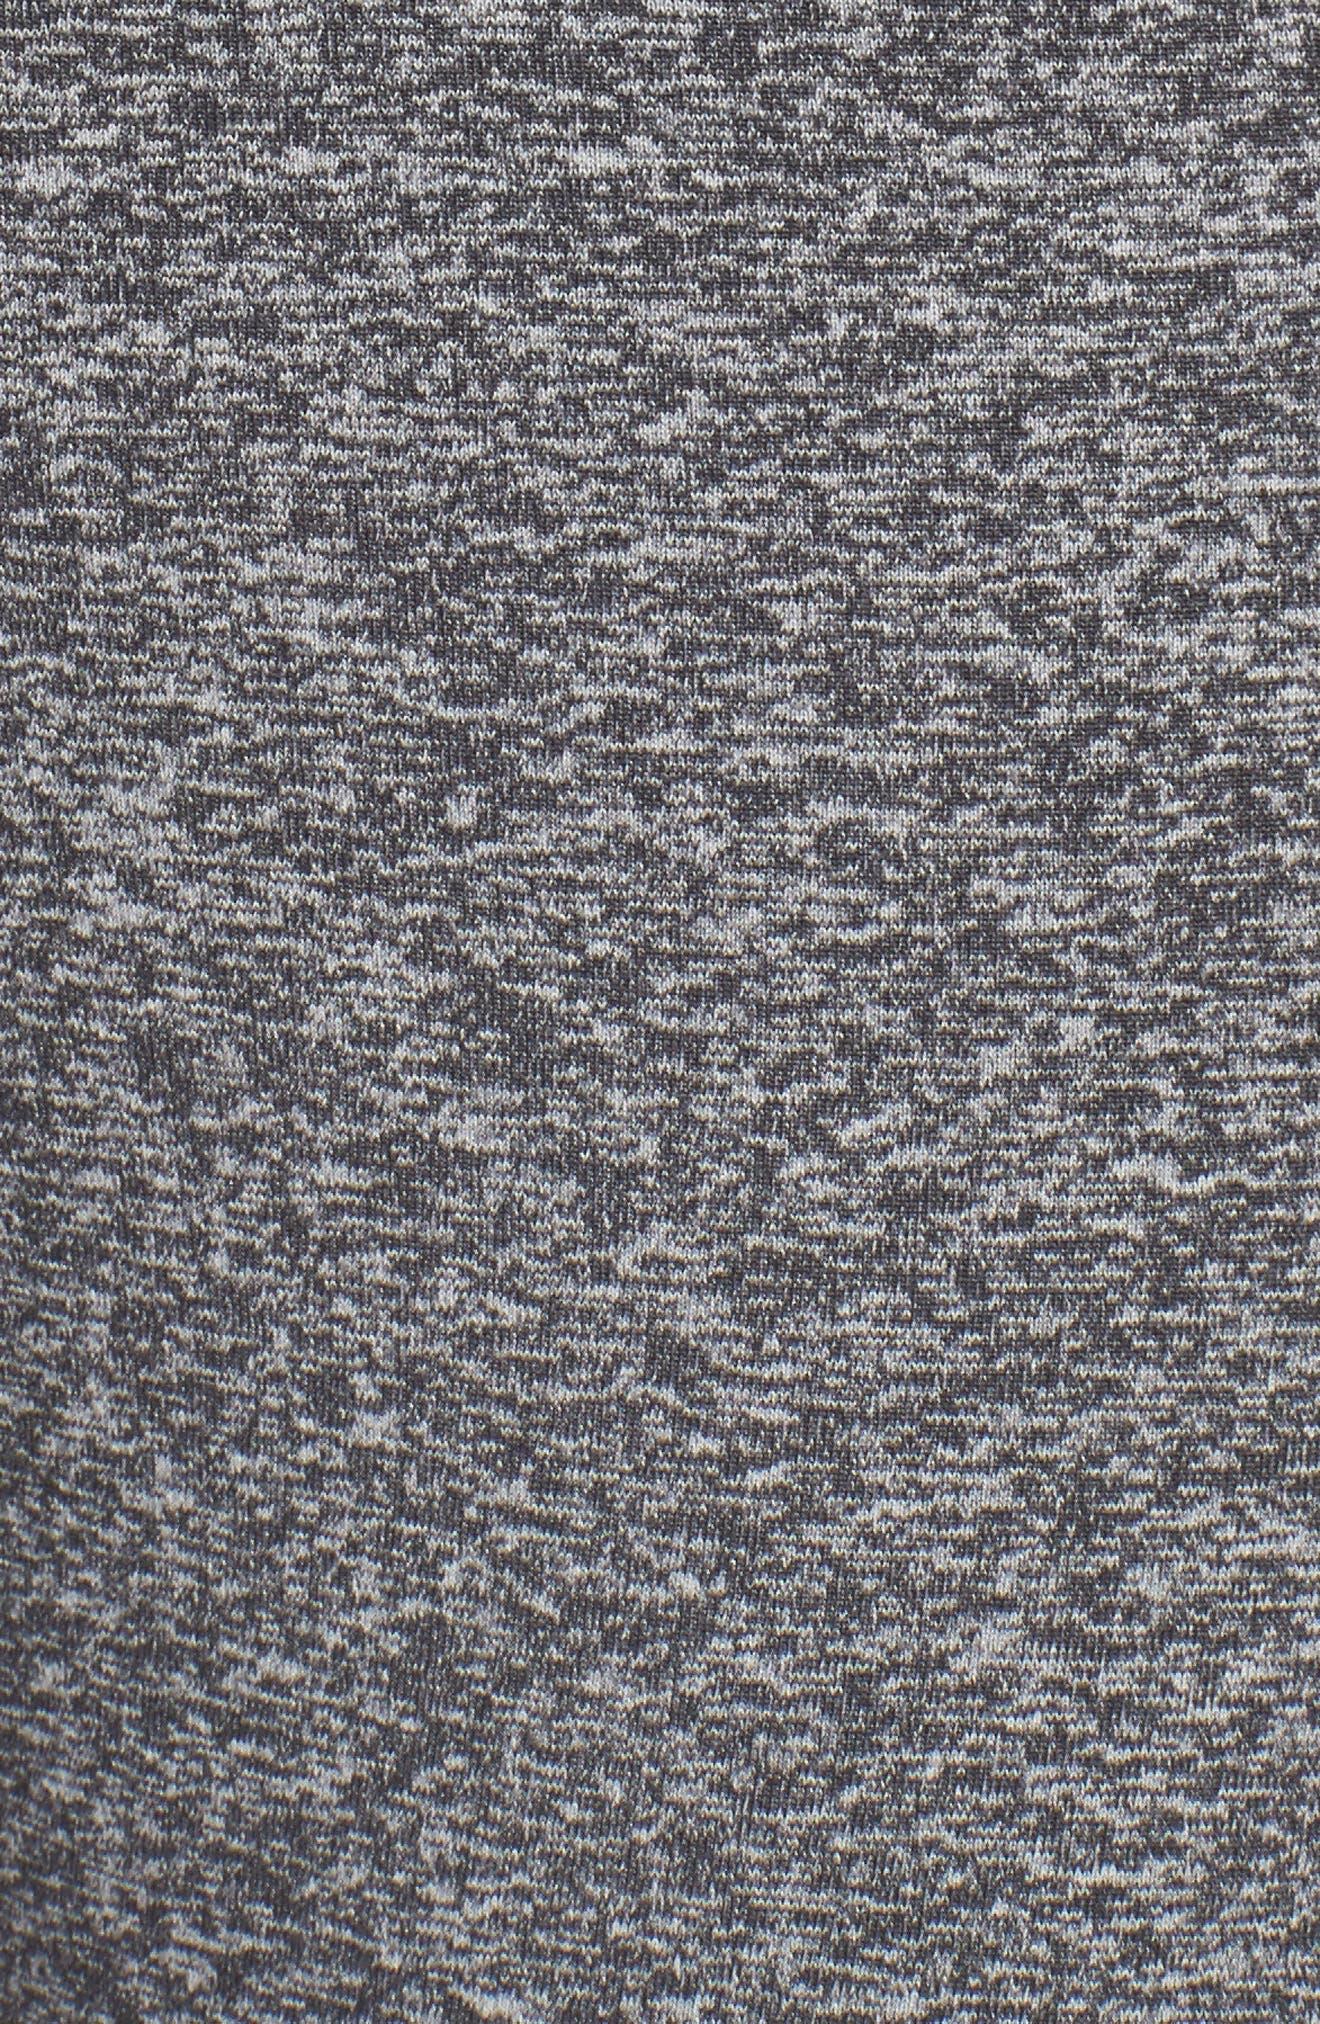 Sporty Splice High Waist Crop Leggings,                             Alternate thumbnail 6, color,                             030